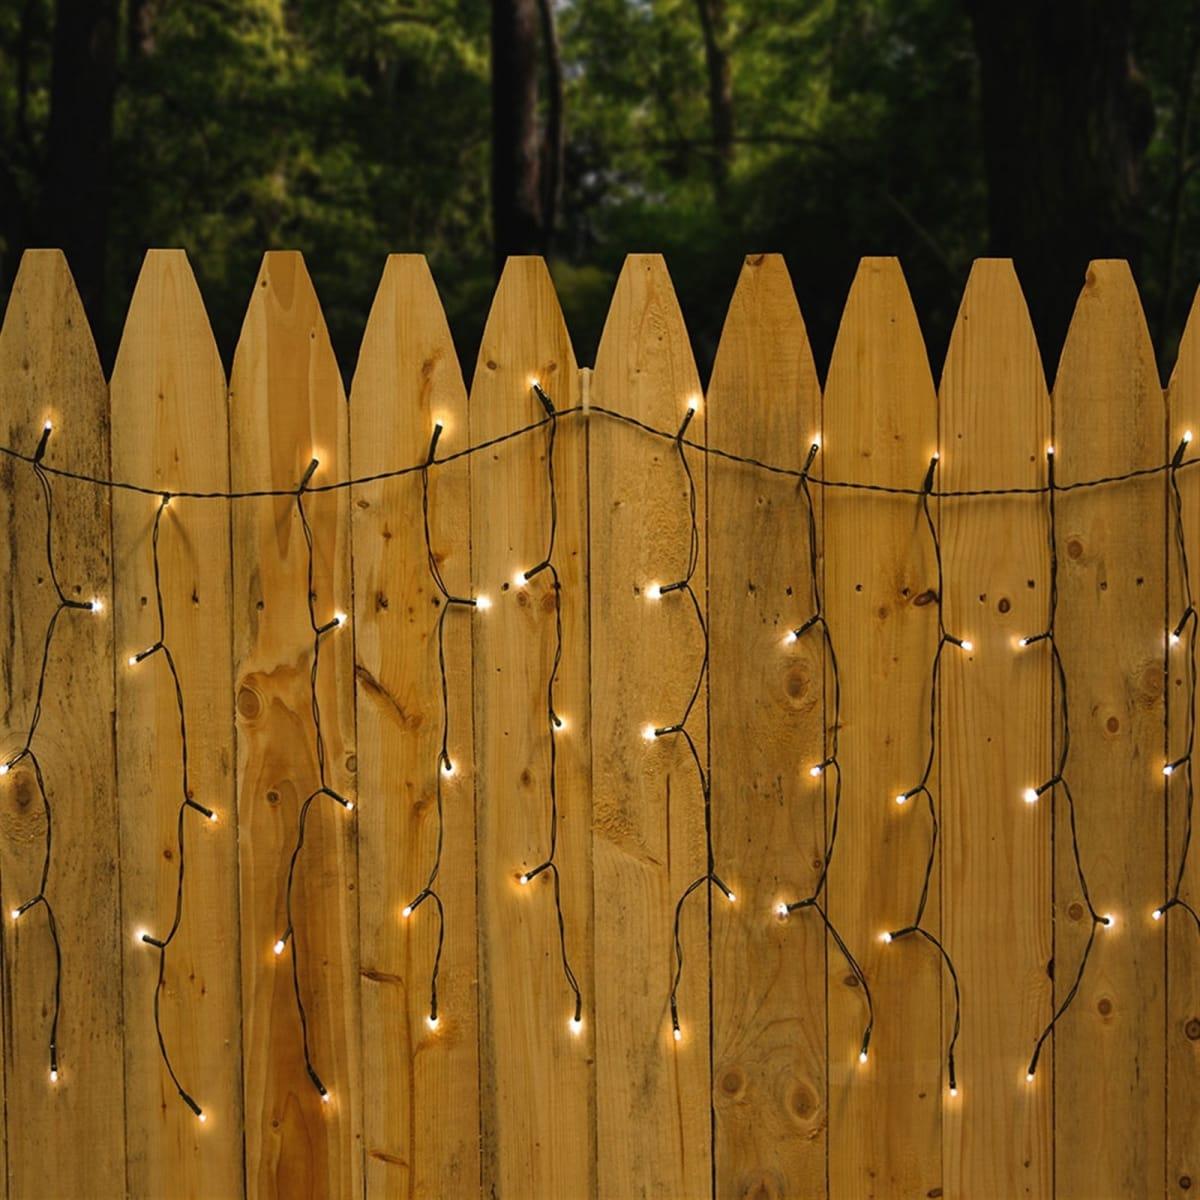 110 LED Outdoor Solar Curtain String Light- .99!